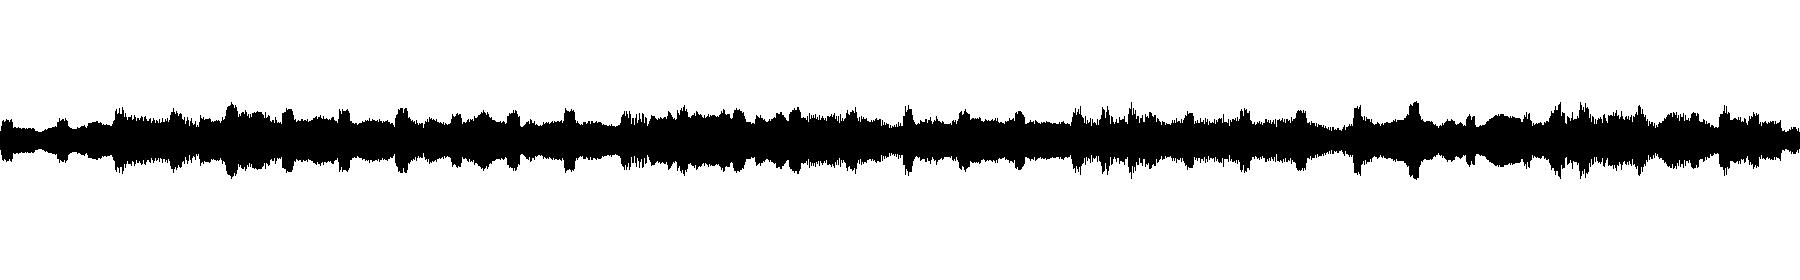 flute   135bpm   c maj